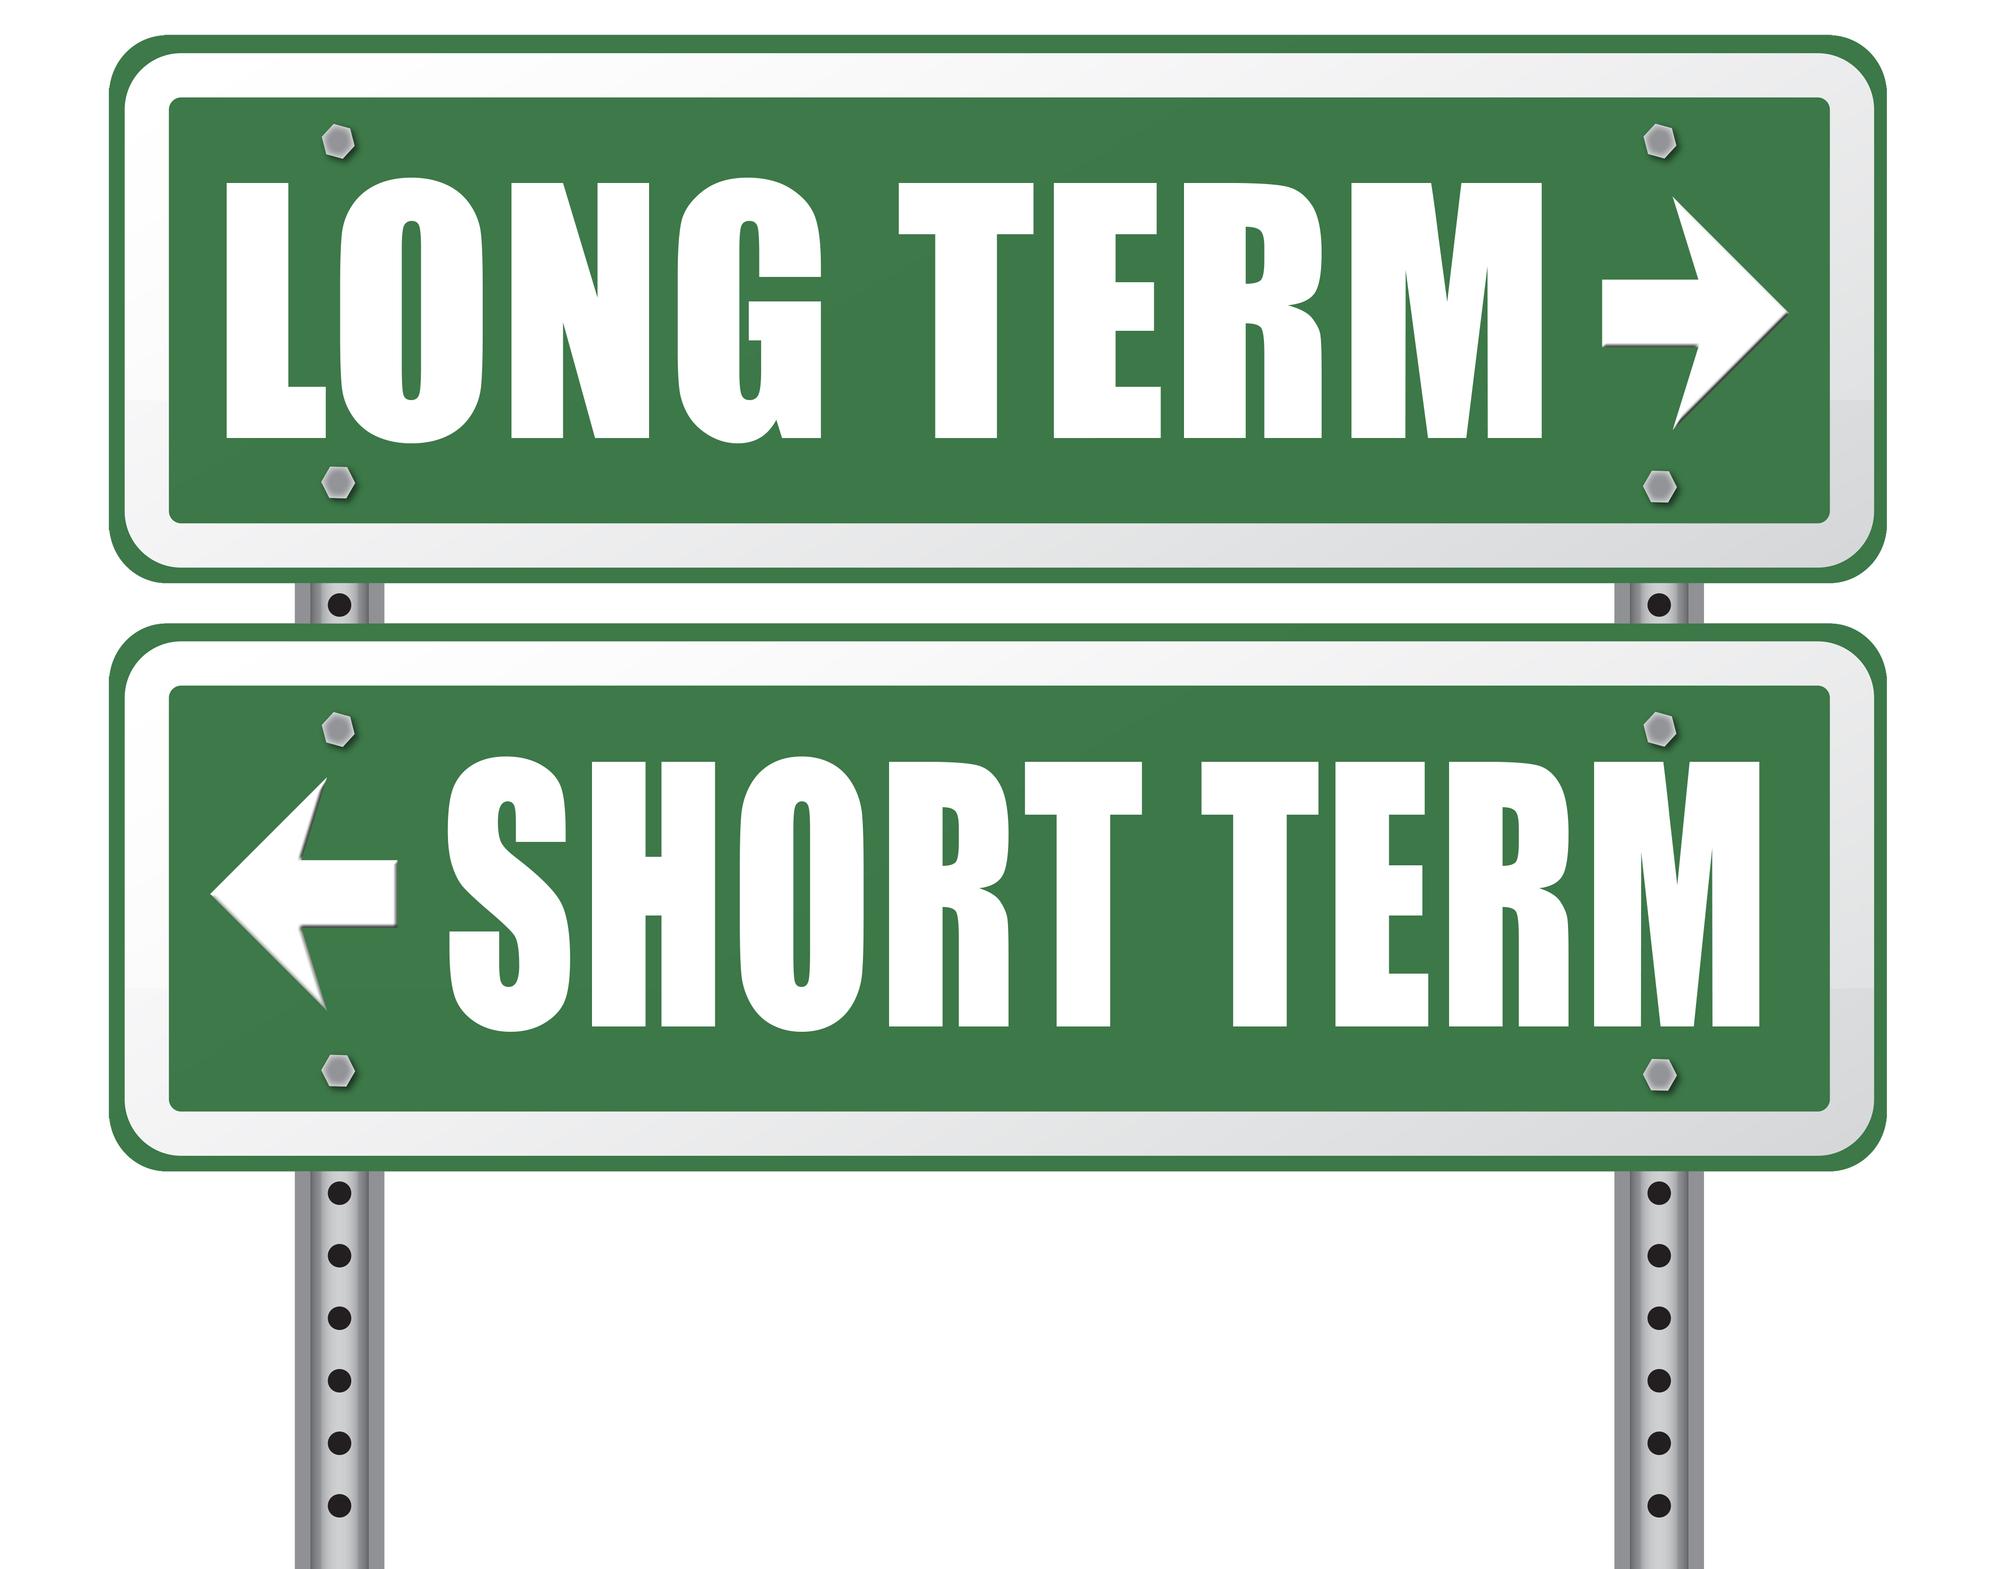 long-term electricity plan vs short-term electricity plan text